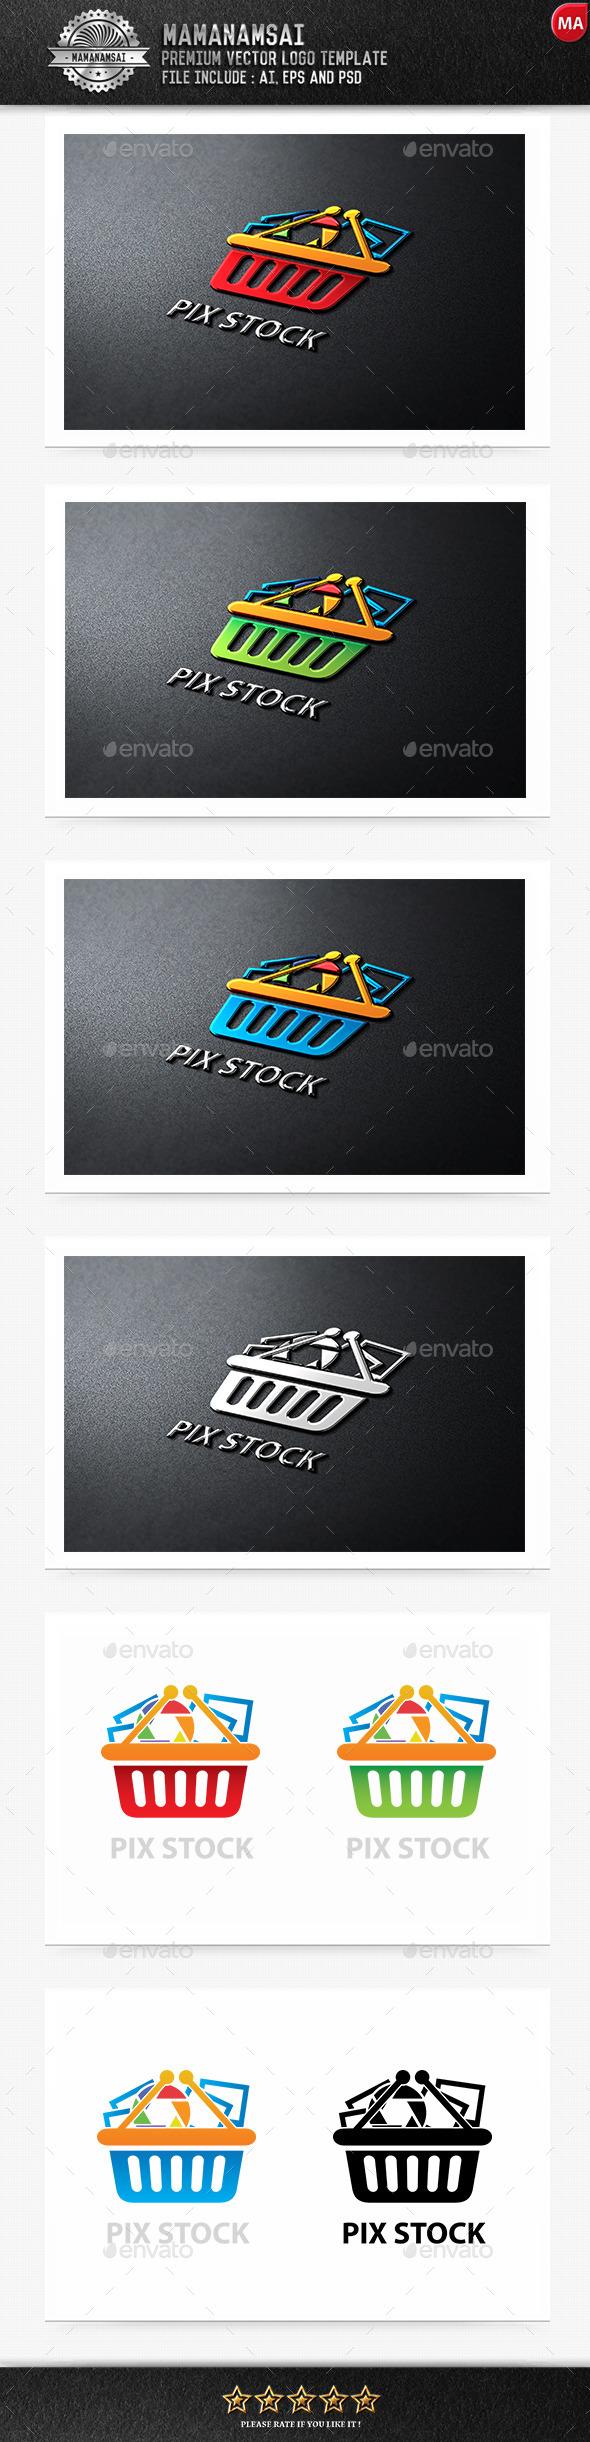 Pix Stock Logo - Logo Templates